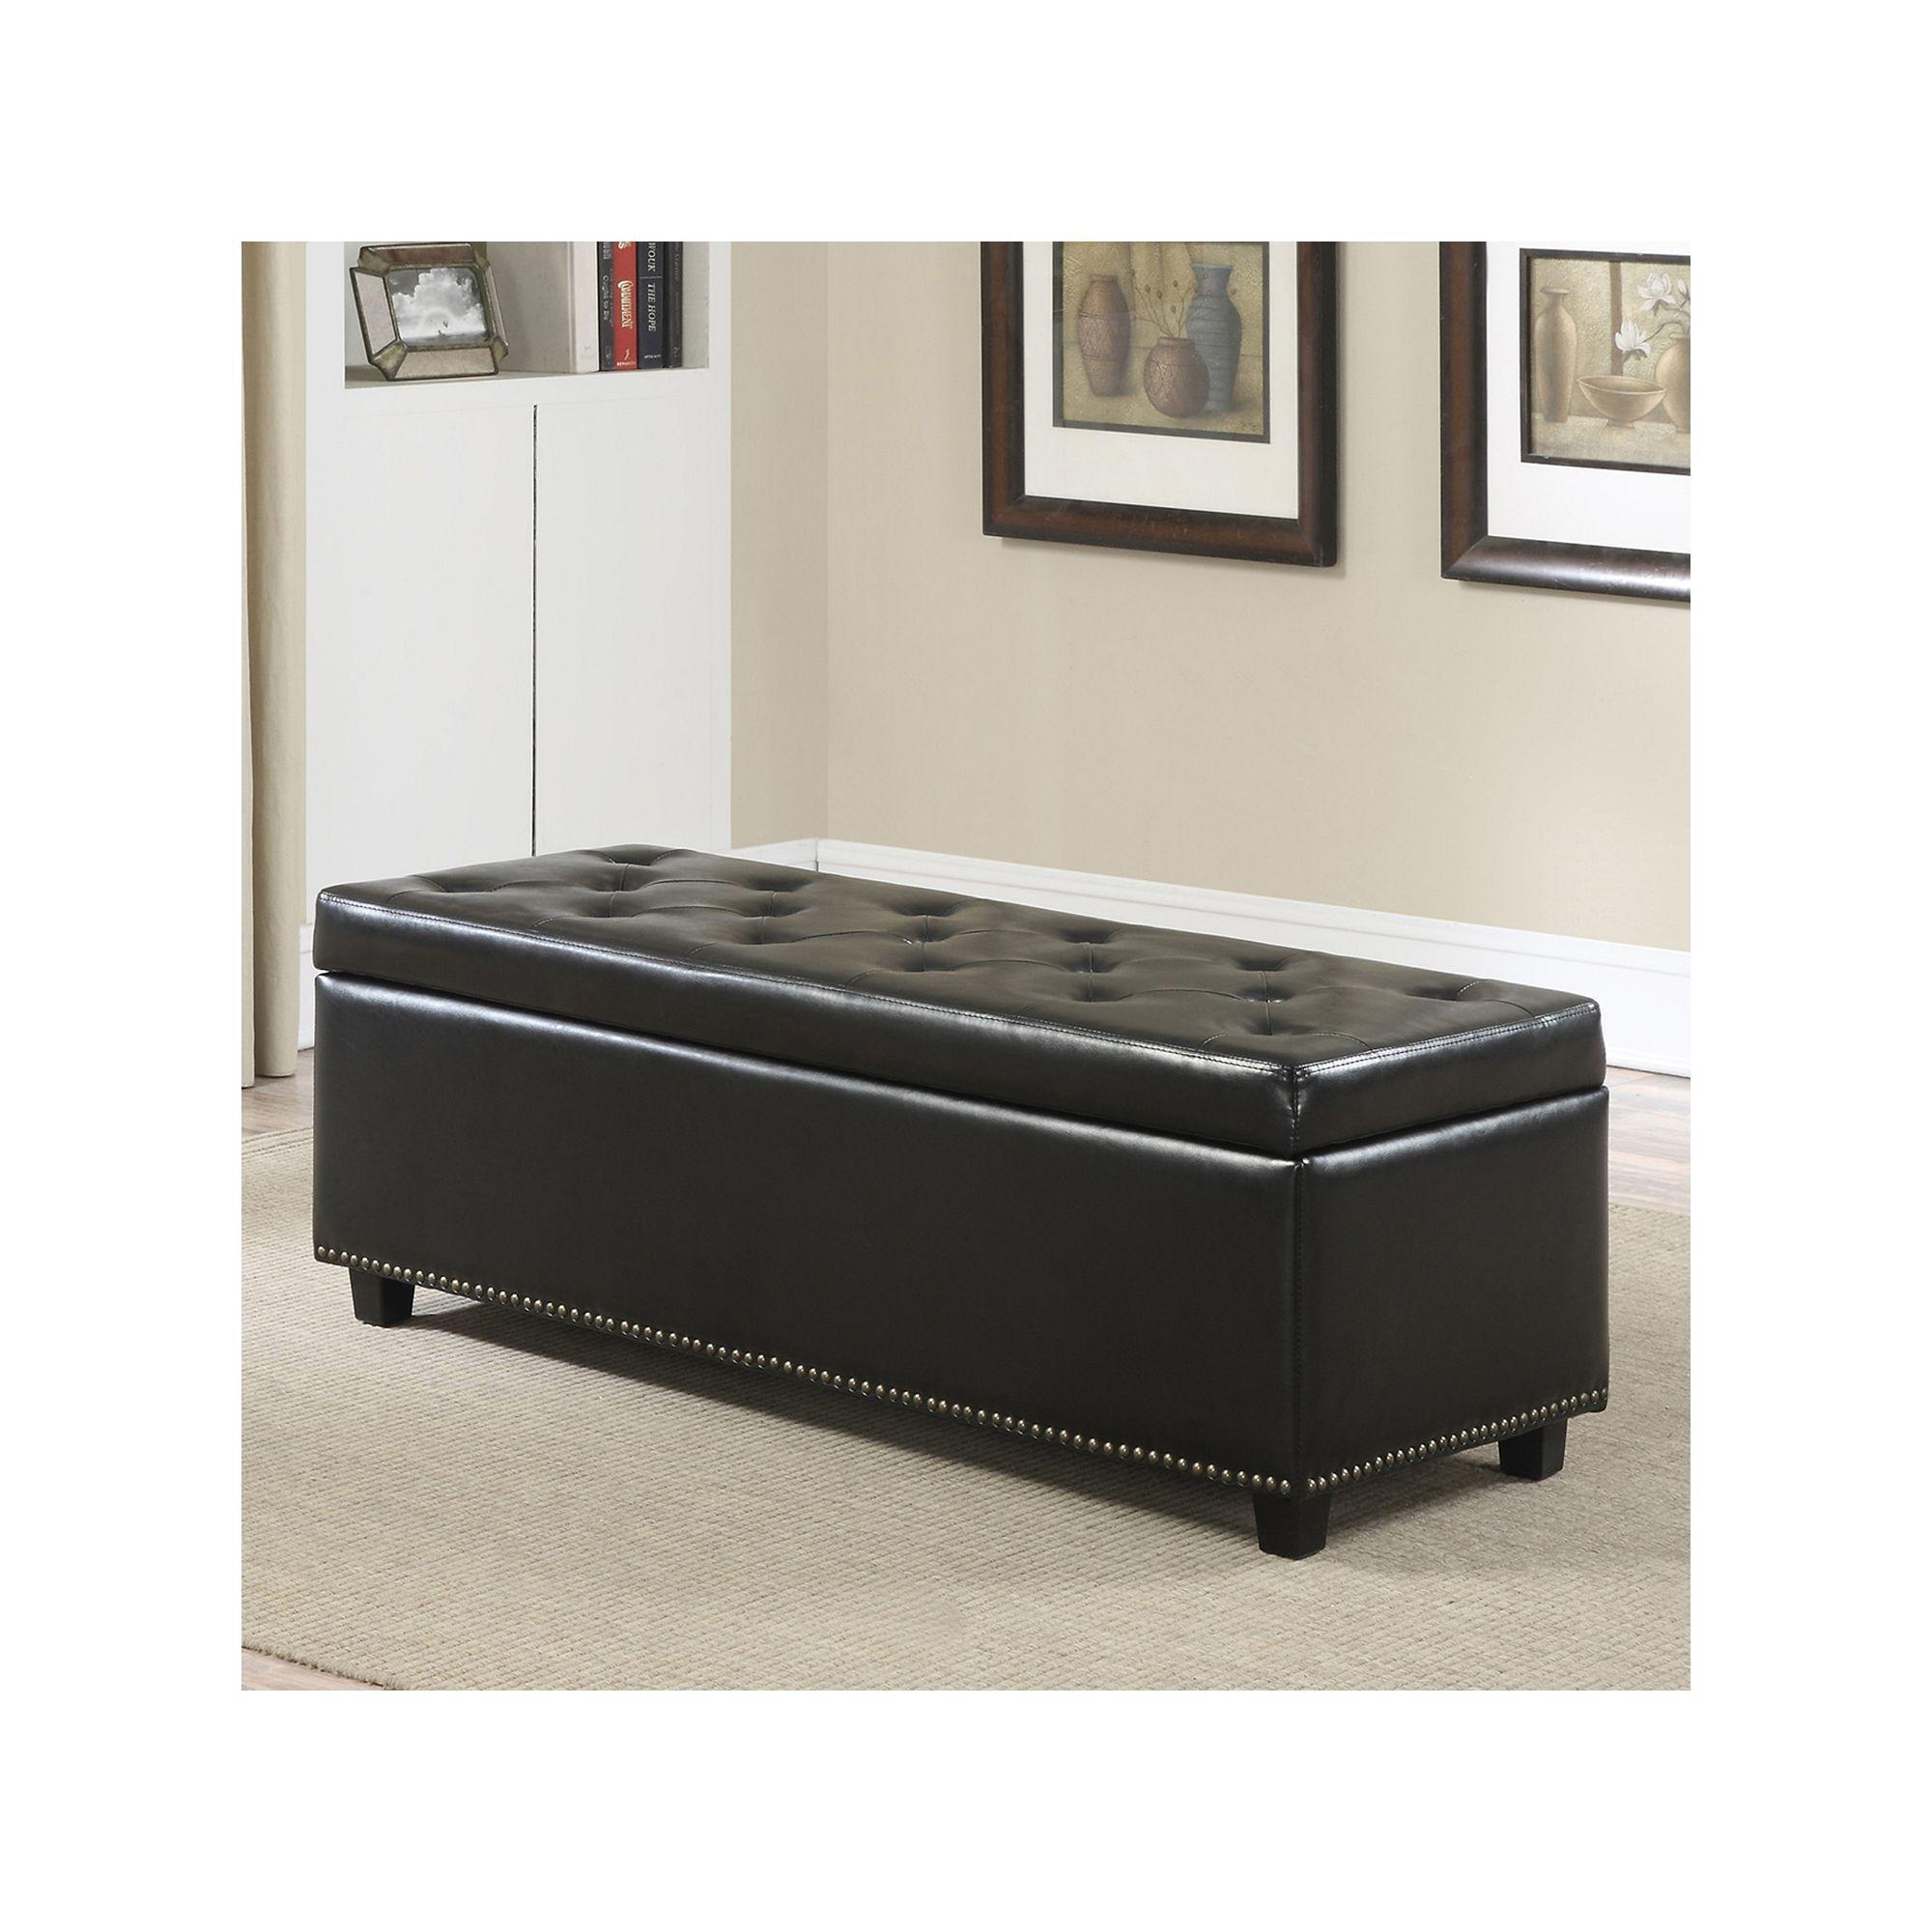 Simpli Home Hamilton Faux Leather Storage Bench, Black